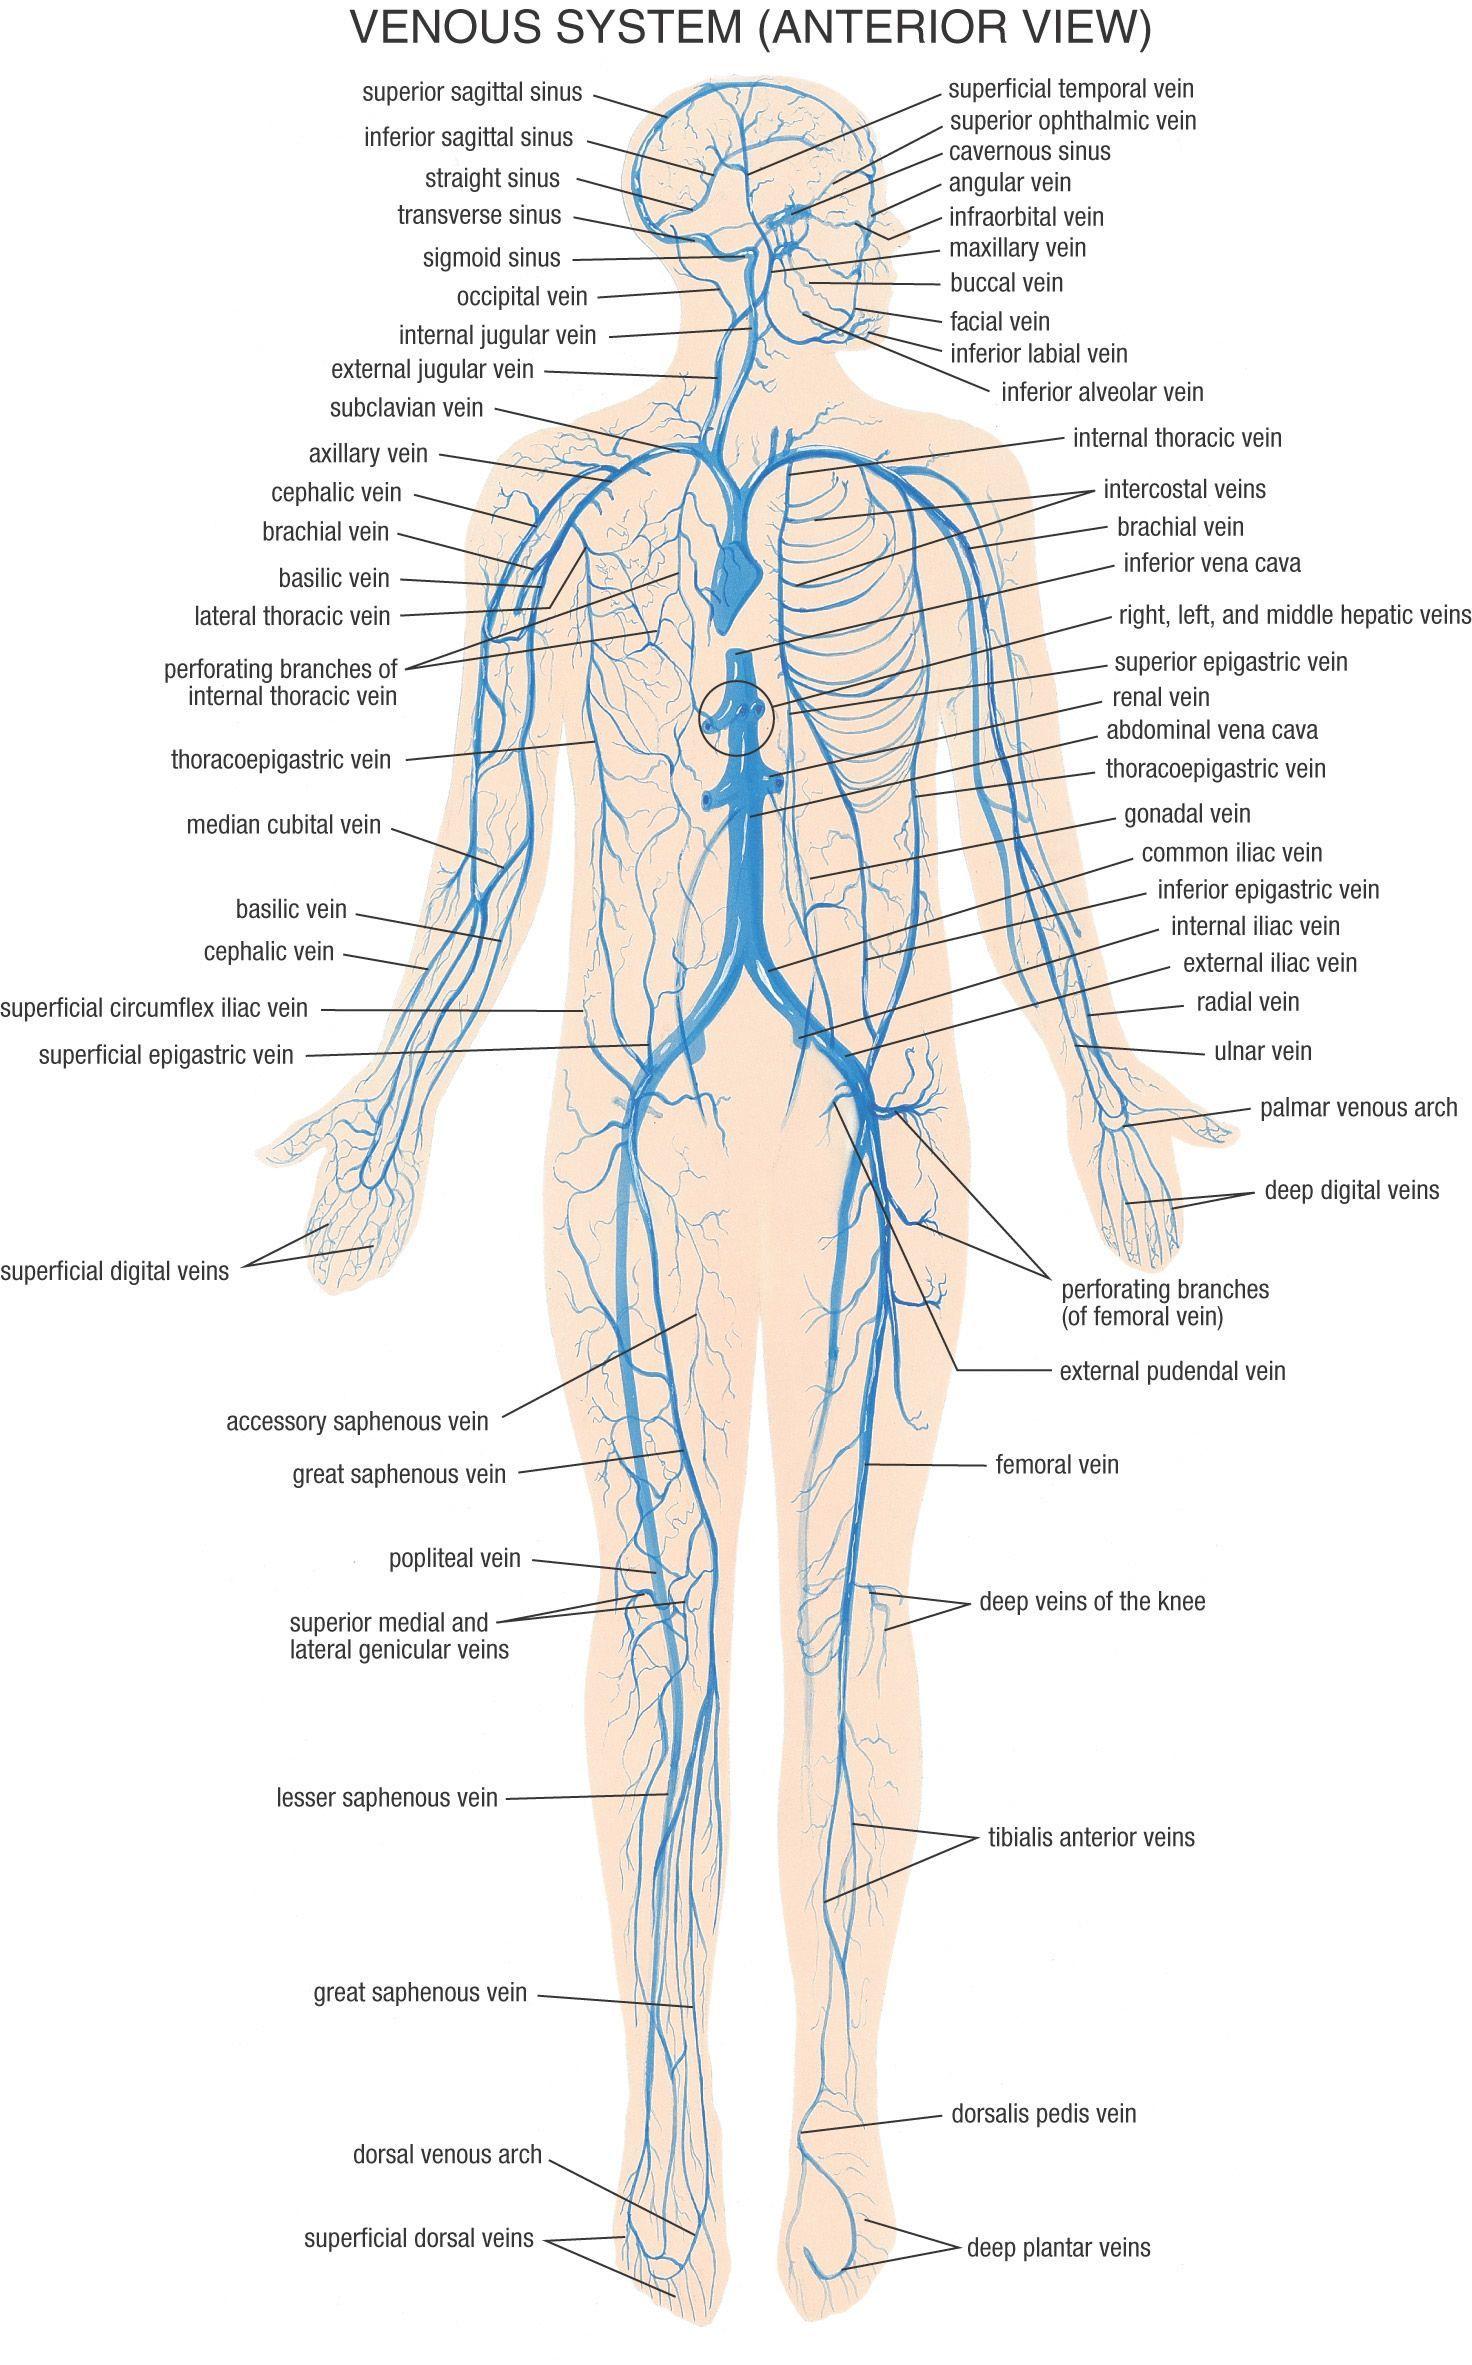 Venous System Humanbodysystem Human Body System Diagram In 2020 Nervous System Anatomy Medical Anatomy Human Body Anatomy